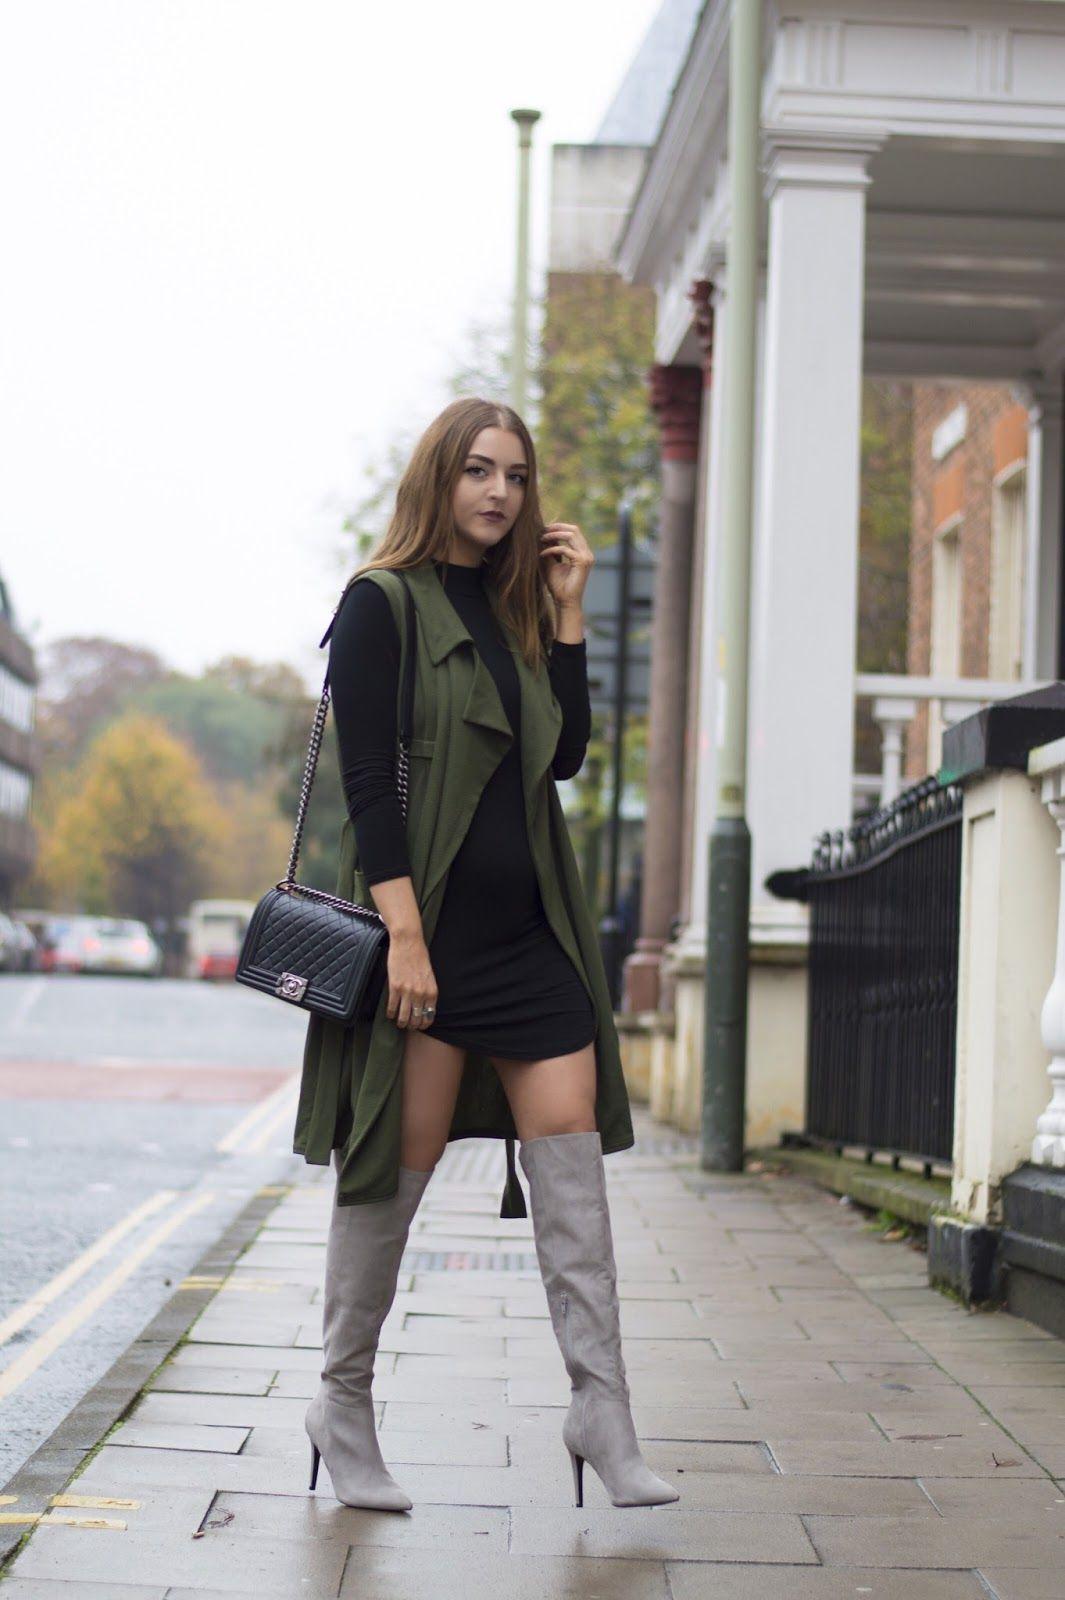 Layla Panam: Khaki / Chanel Bag